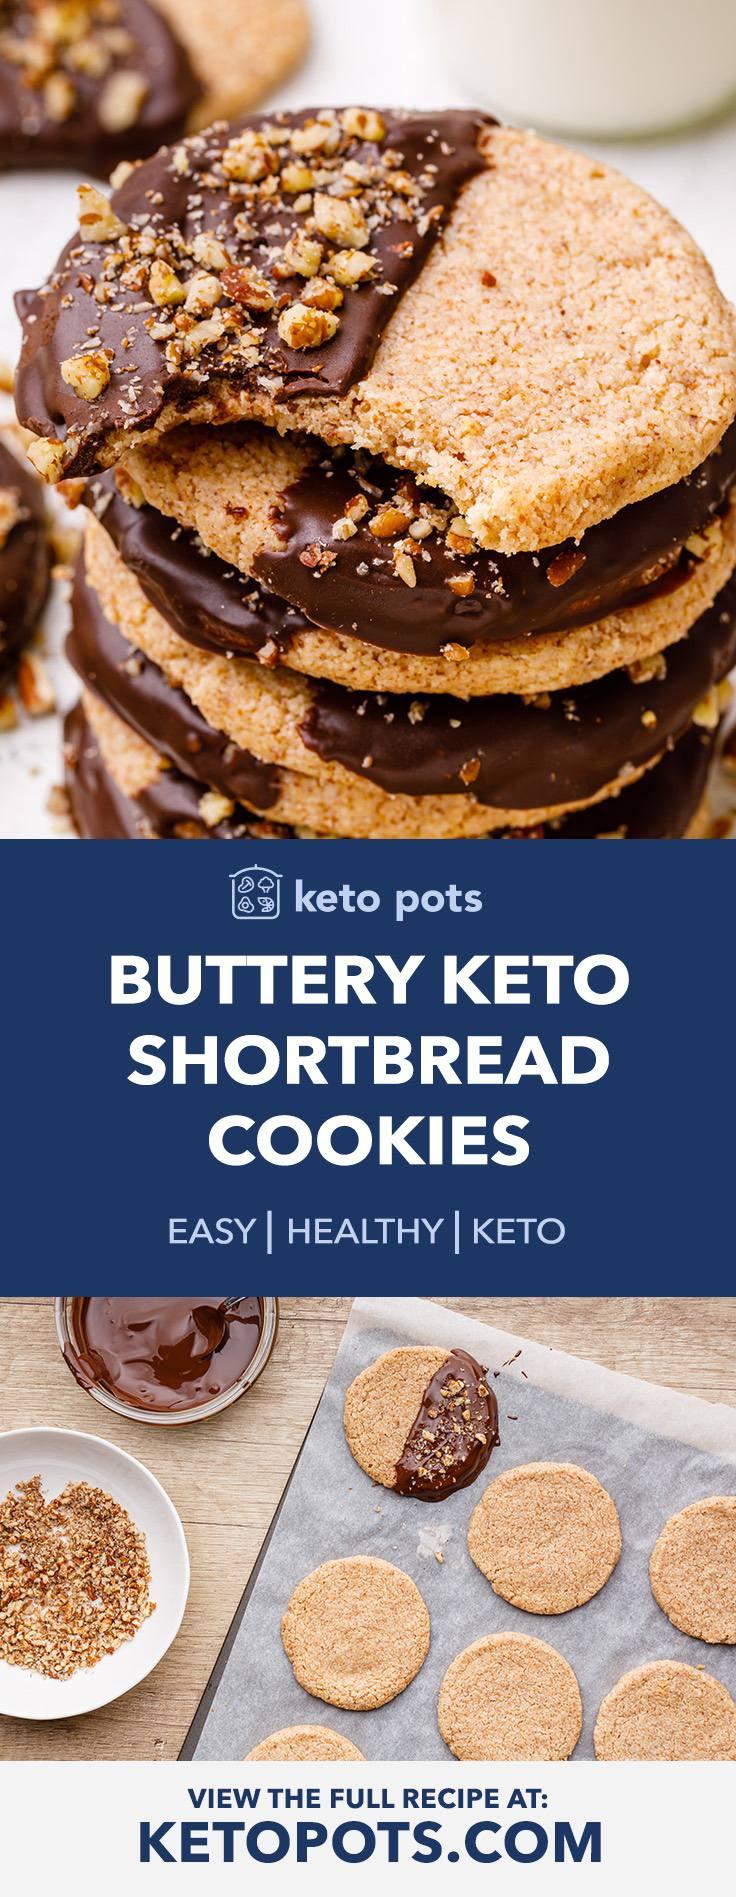 Keto Shortbread Cookies with Pecan Dust Crumble